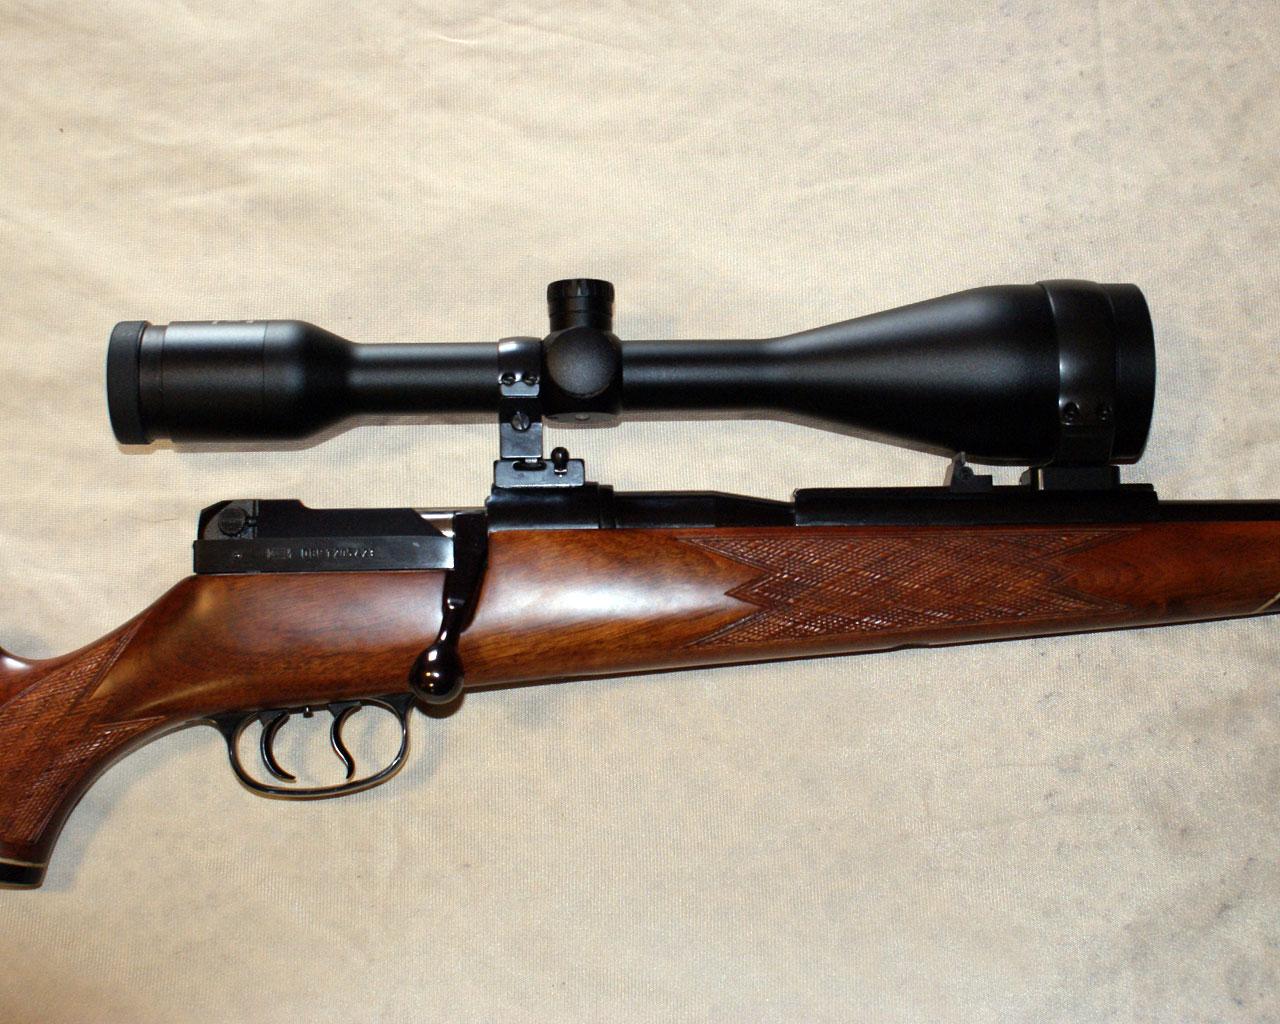 EAW Rifle-scope Mounts - Revivaler